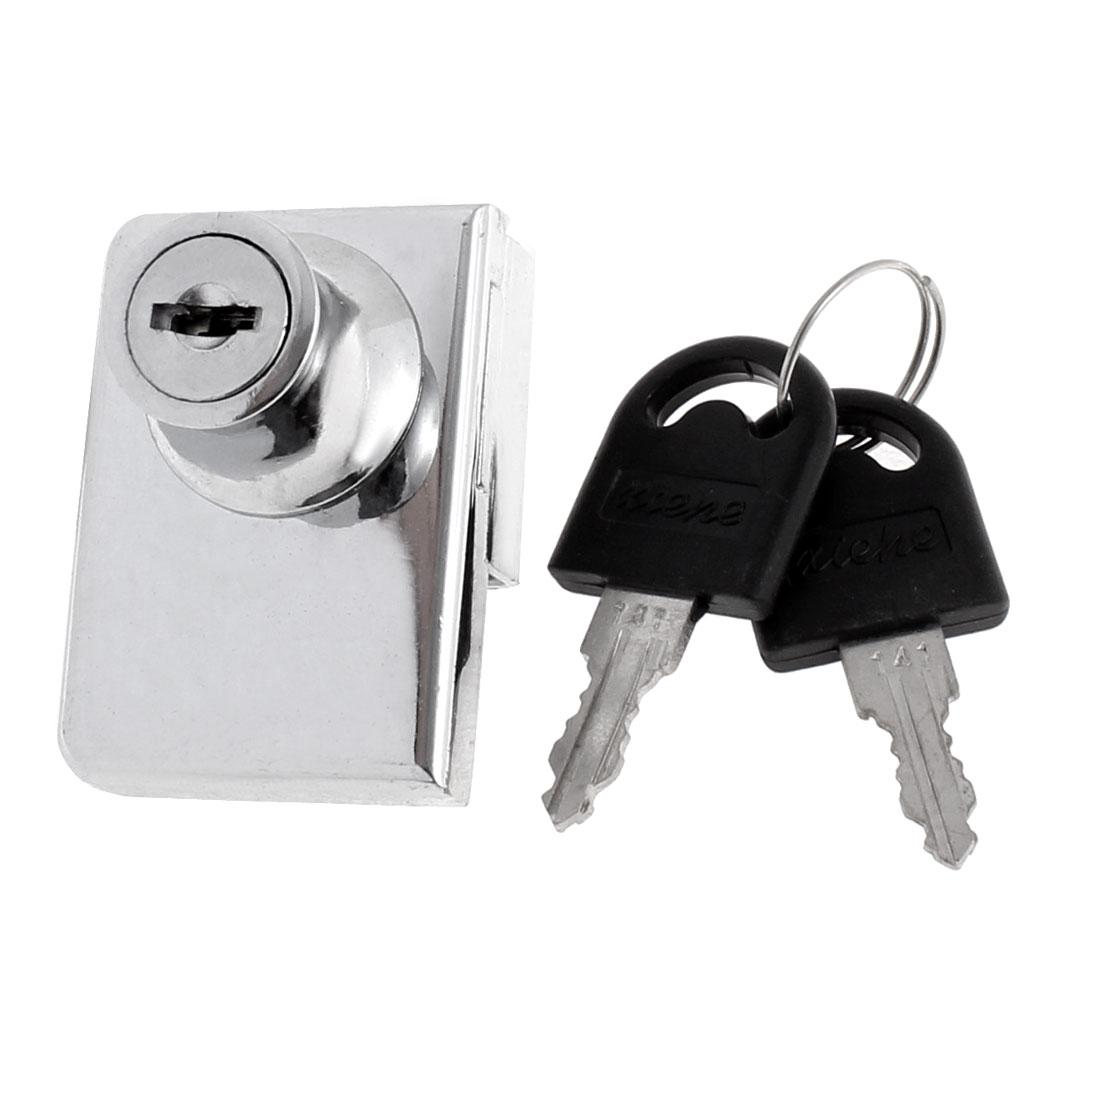 Display Cupboard Cabinet Glass Door Toolbox Safe Drawer Lock w 2 Keys